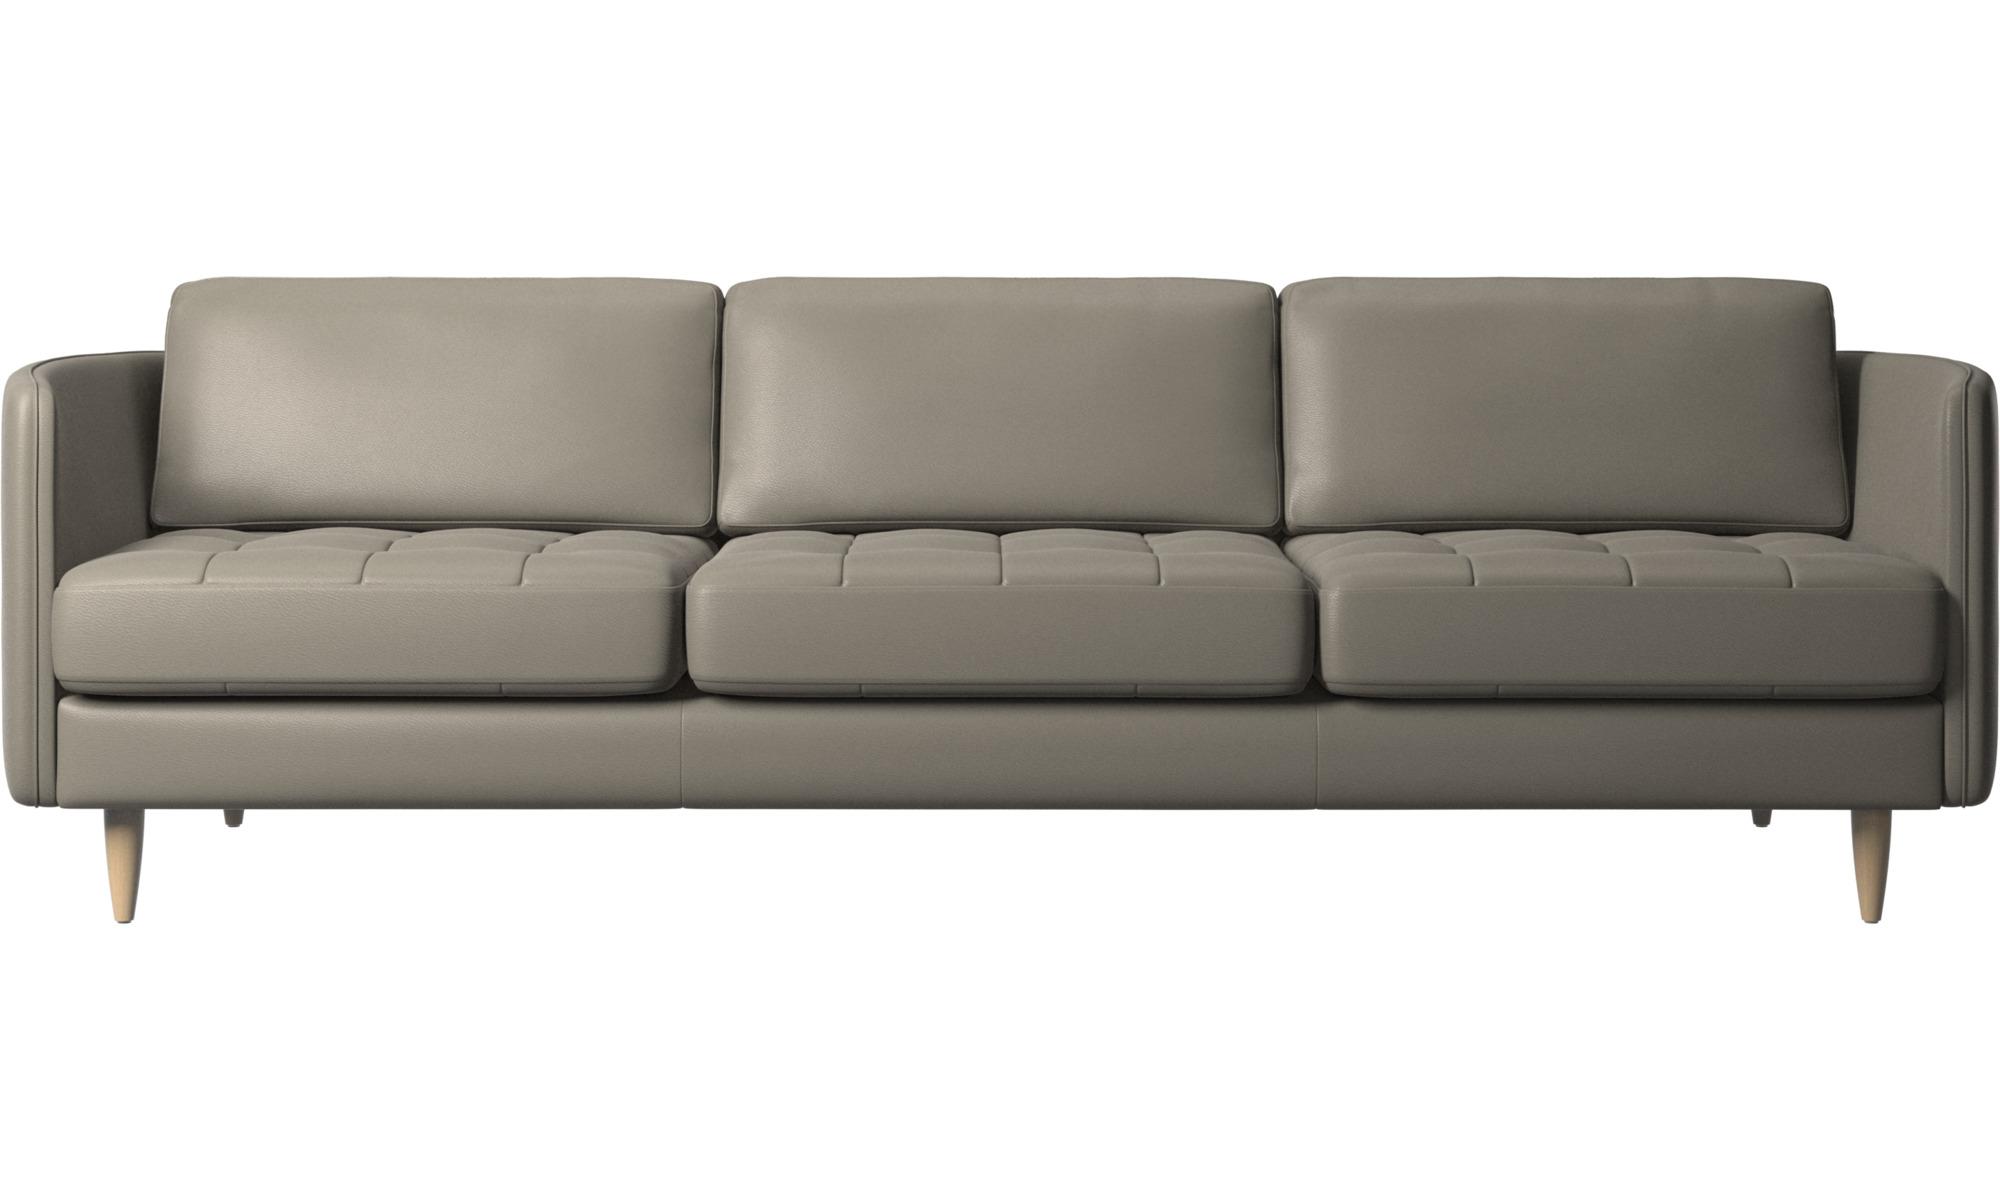 3 personers sofaer - Osaka sofa, tuftet sædehynde - Grå - Læder